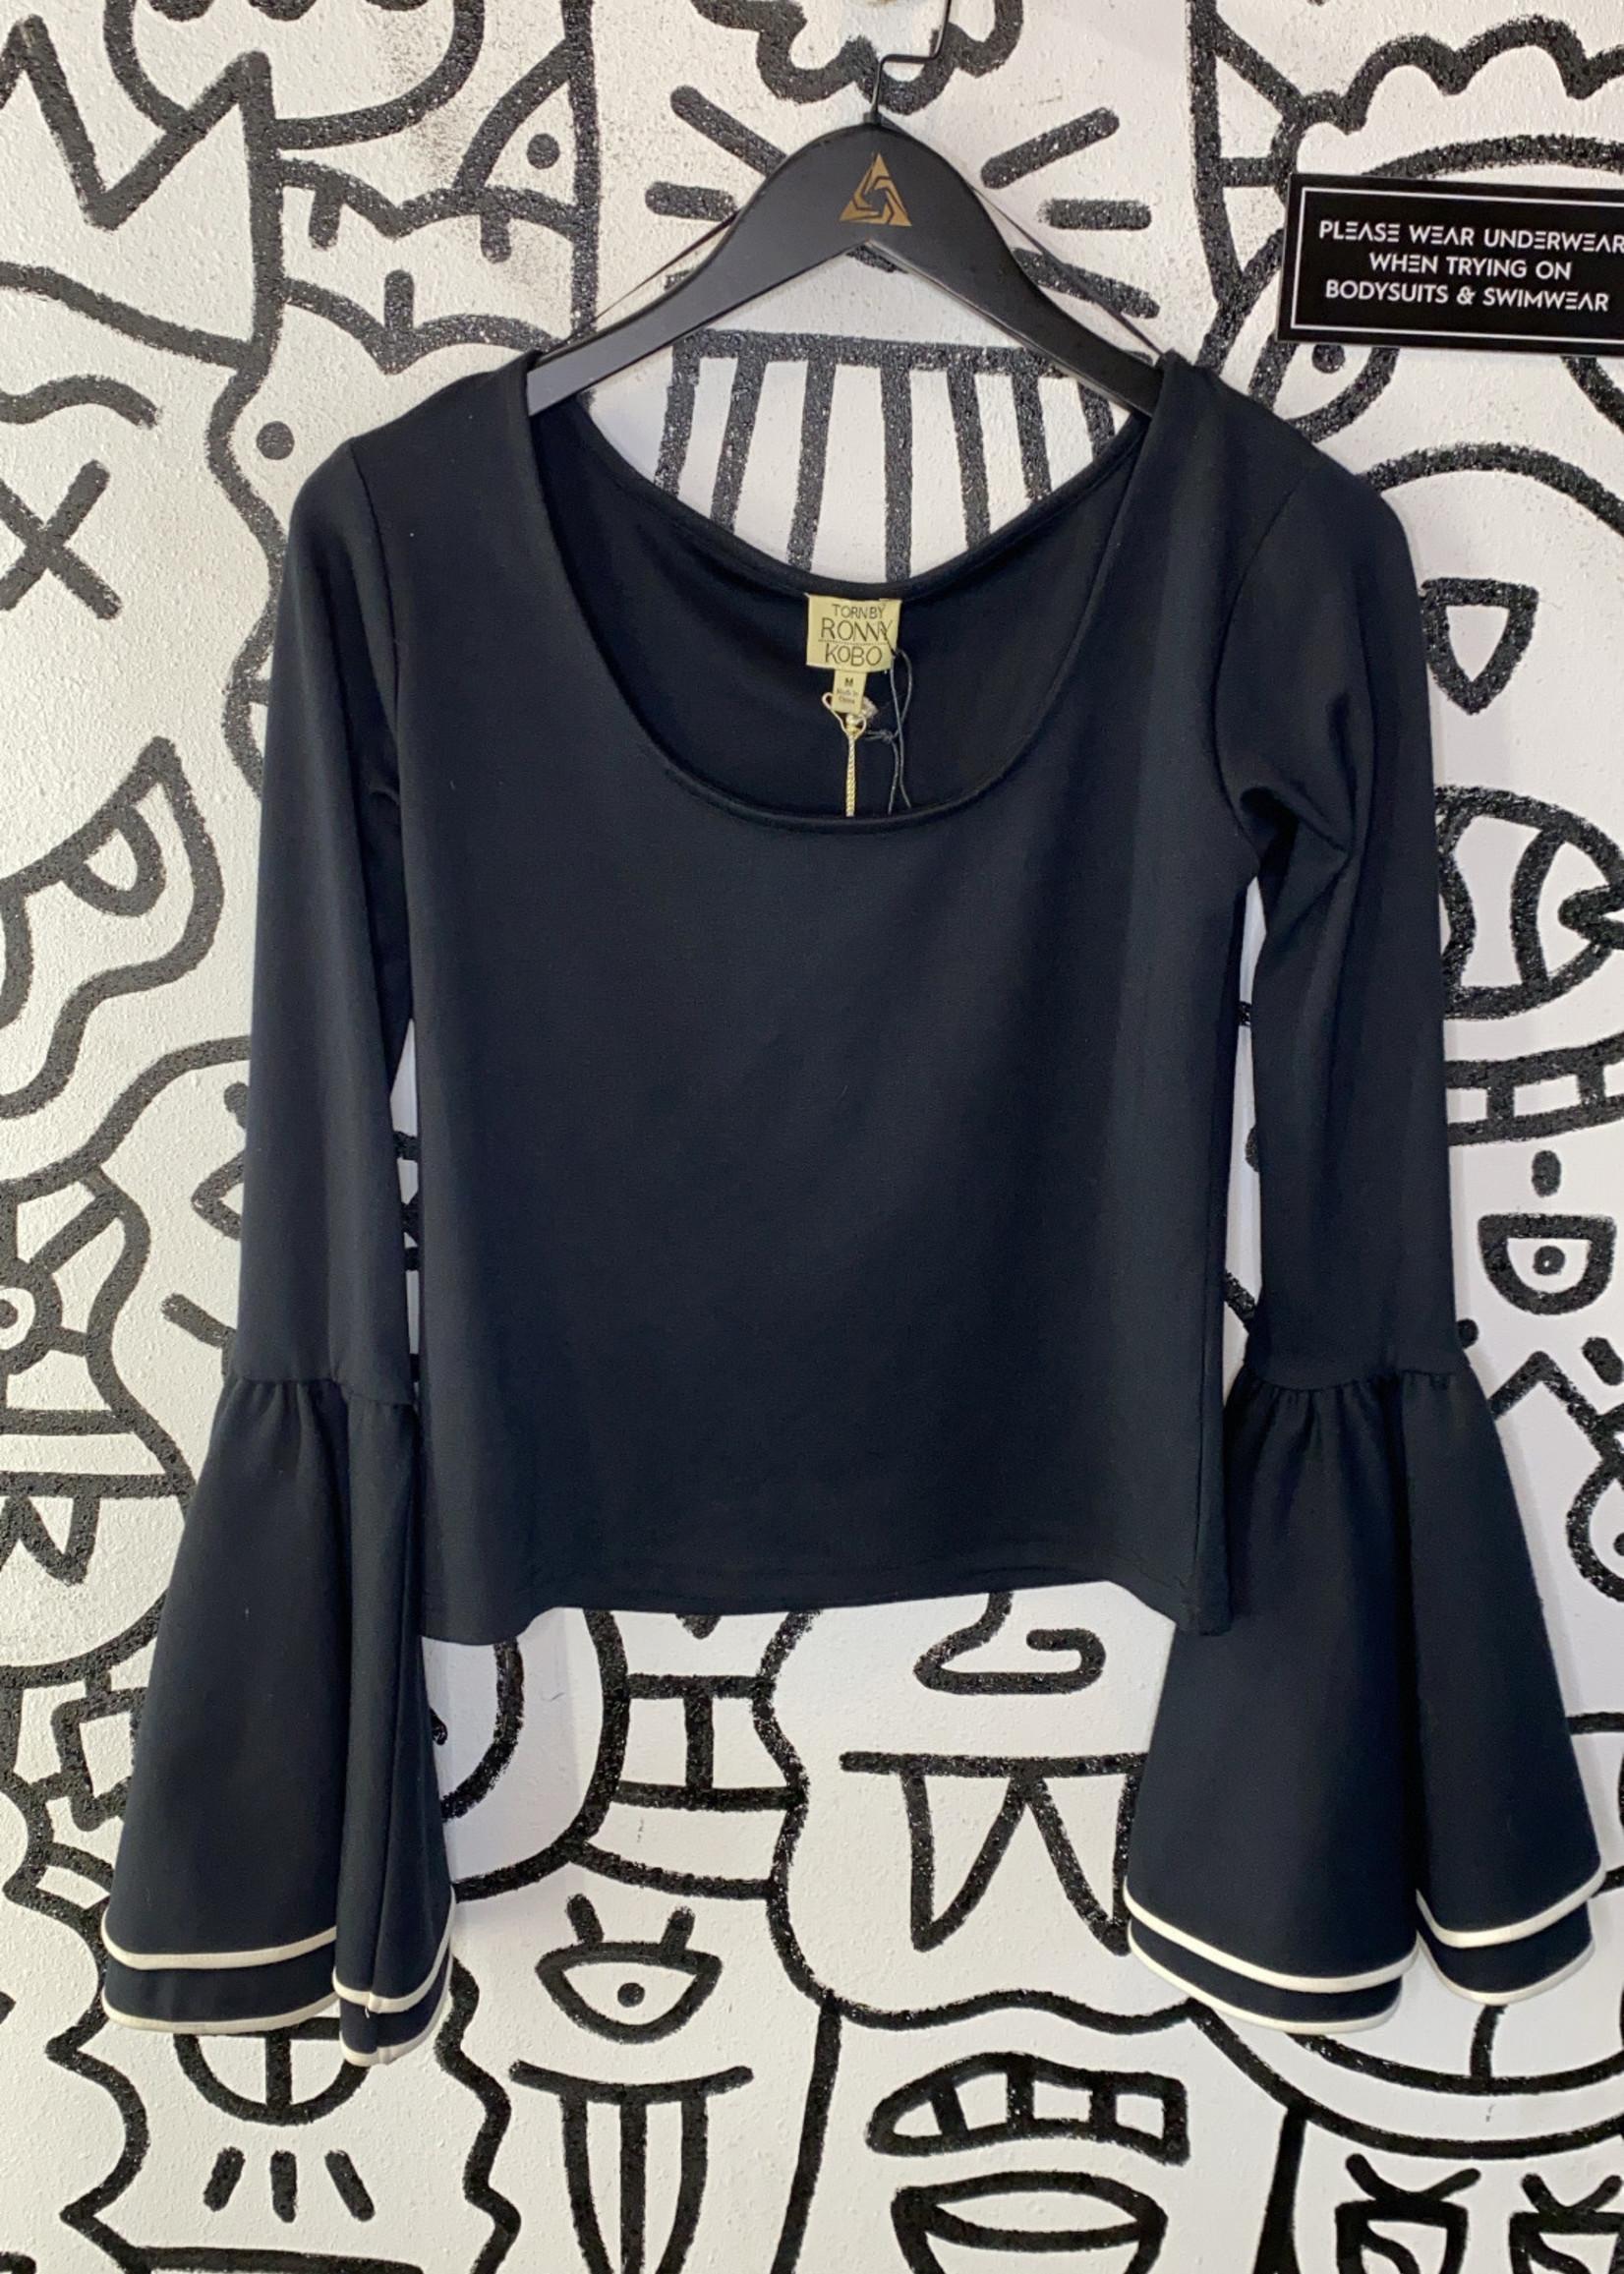 NWT Ronny Kobo Designer Bell Sleeve Top M(Retail: $200+)